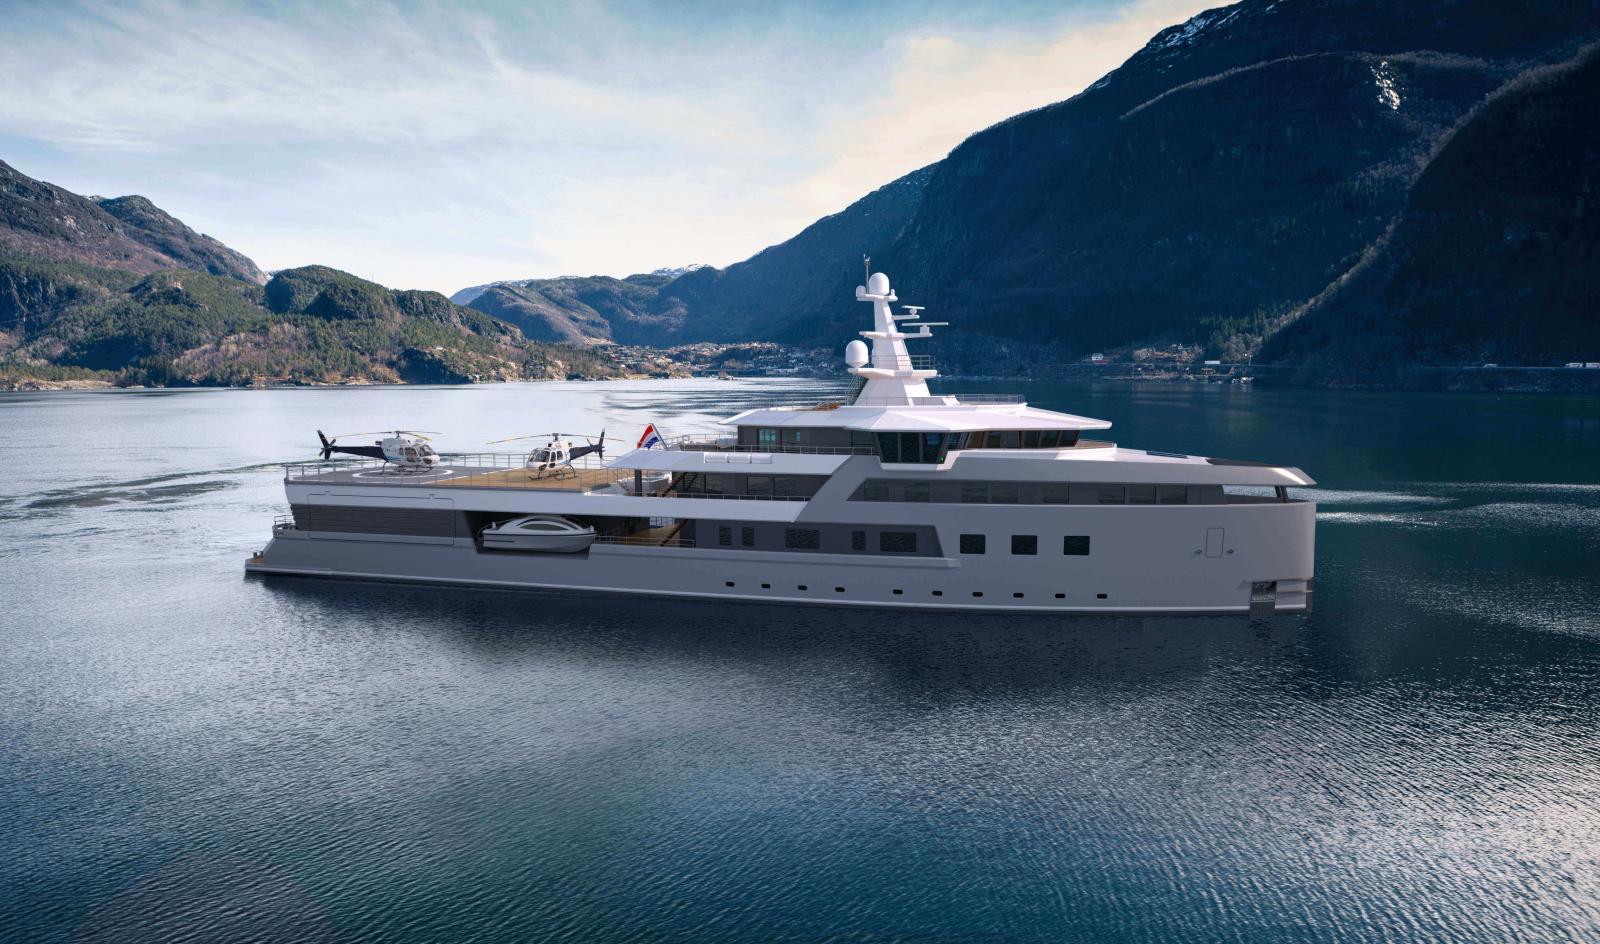 Damen SeaXplorer 75 Metre Expedition Yacht